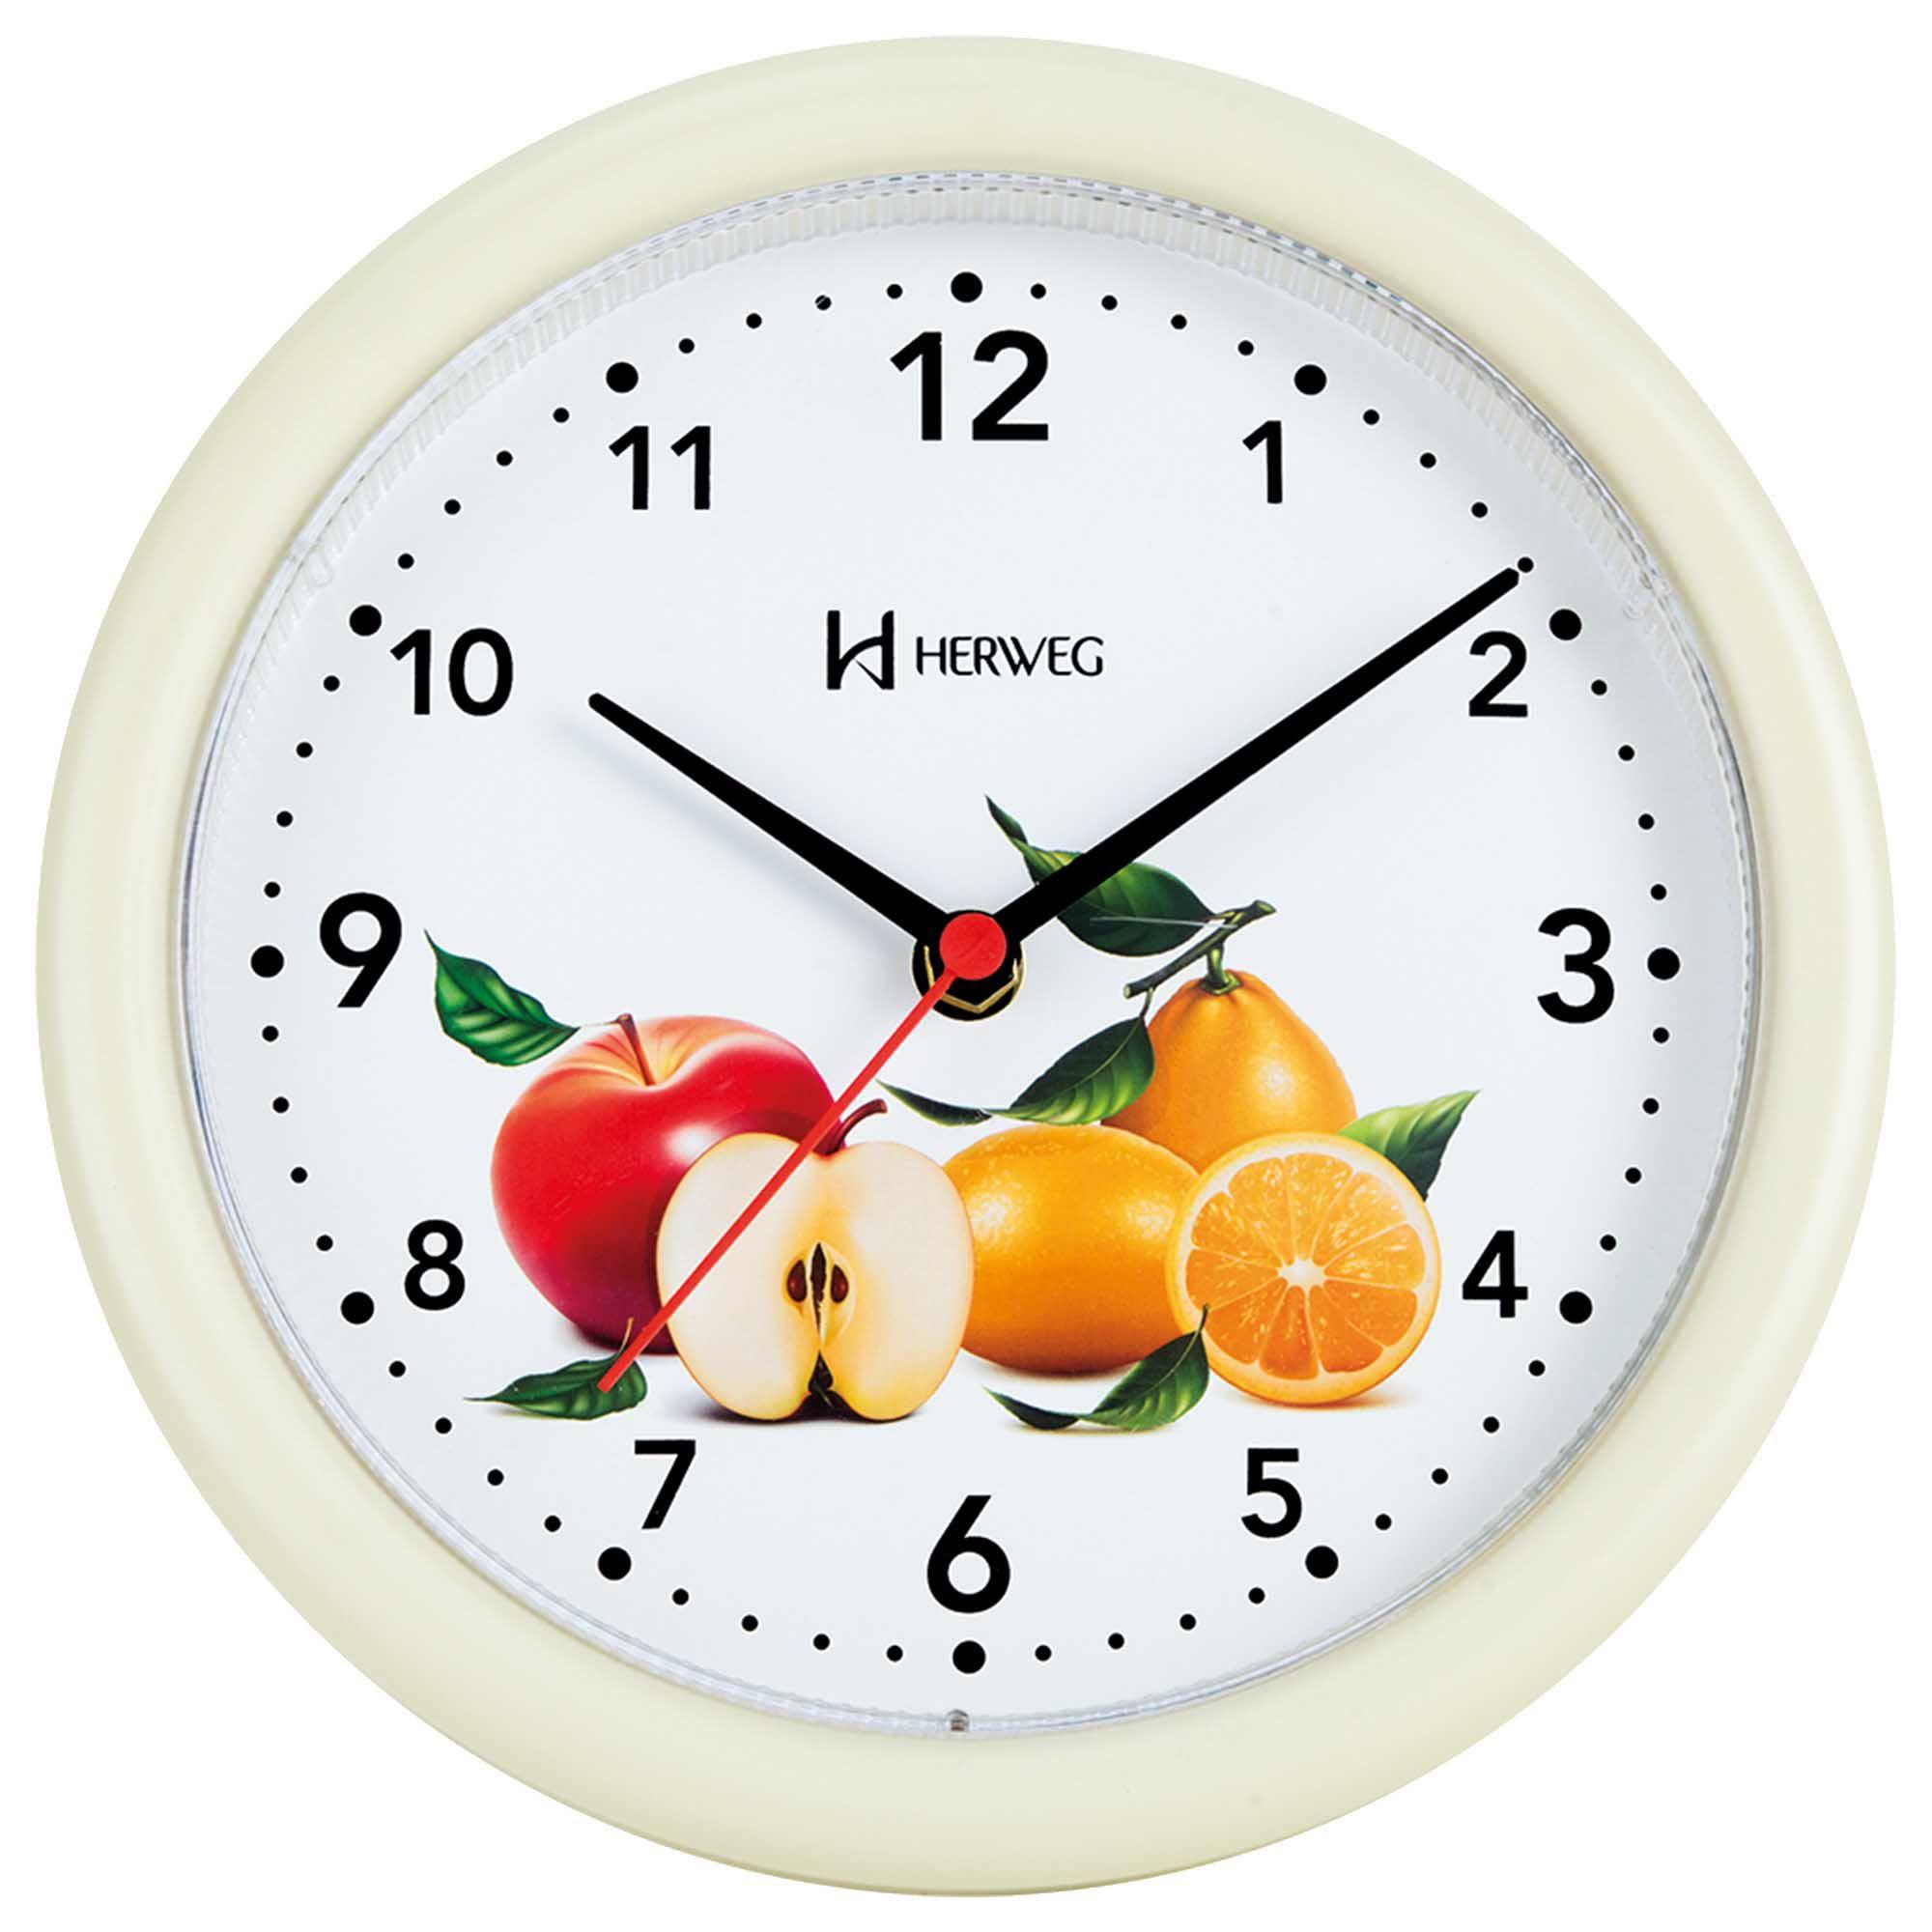 Relógio de Parede Analógico Herweg 6105 032 Marfim